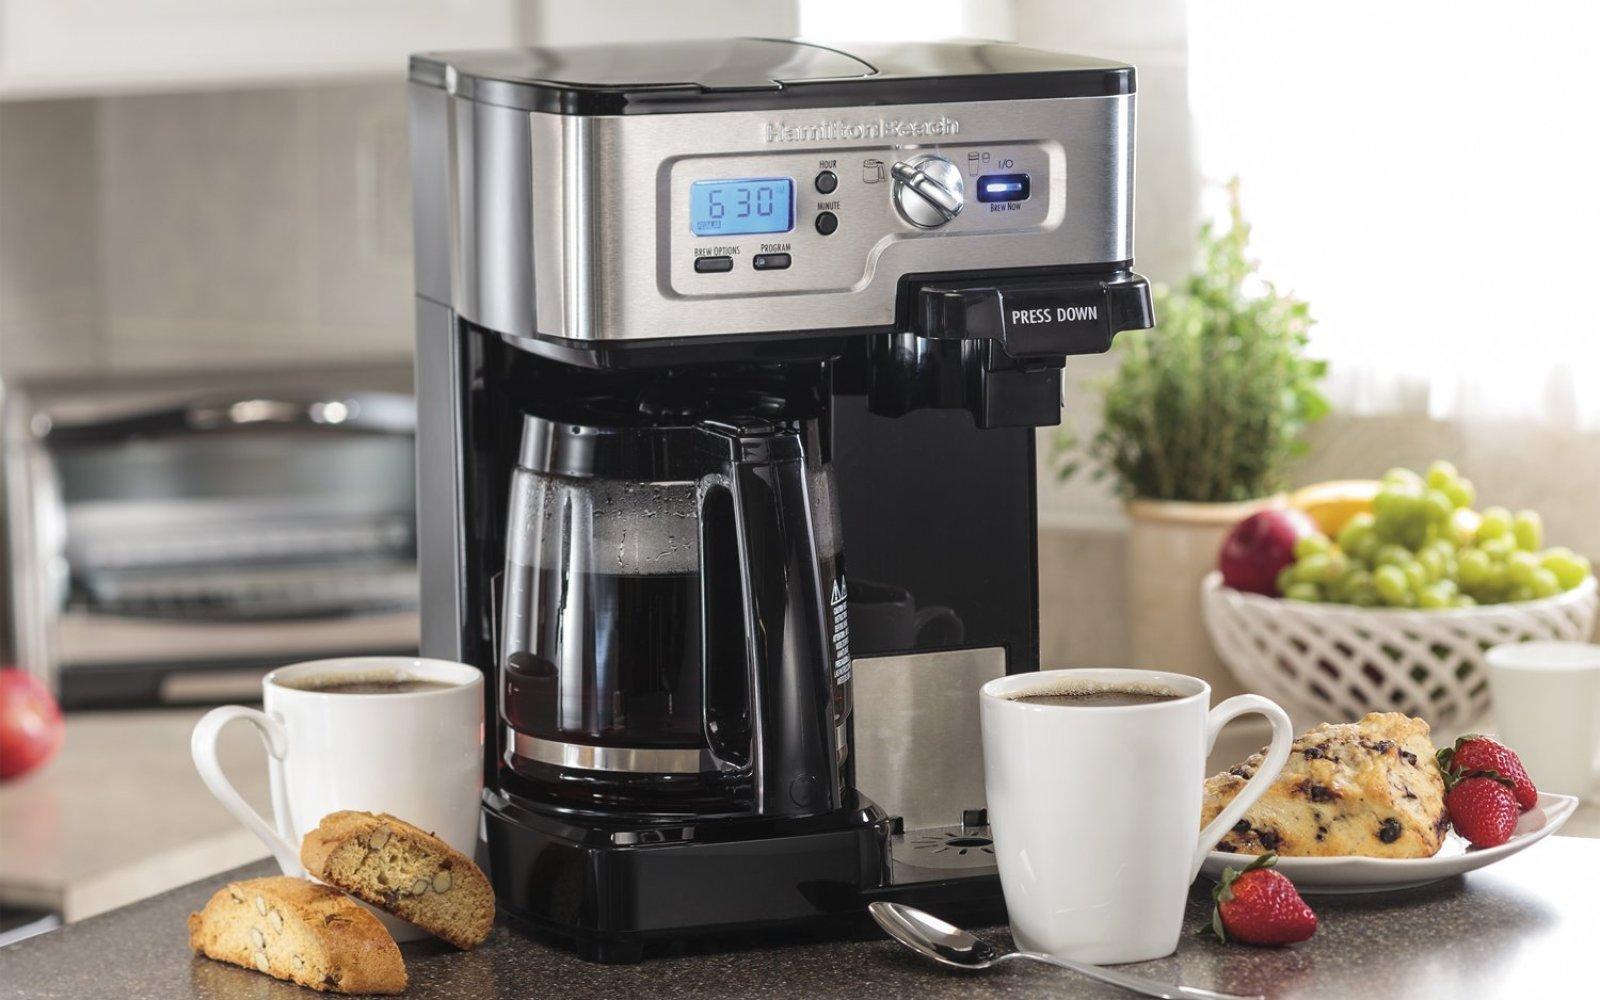 Home: Hamilton Beach K-Cup coffee maker $72 (Reg. $100), Rubbermaid 34-pc Food Storage $12 (Reg. $20+), more